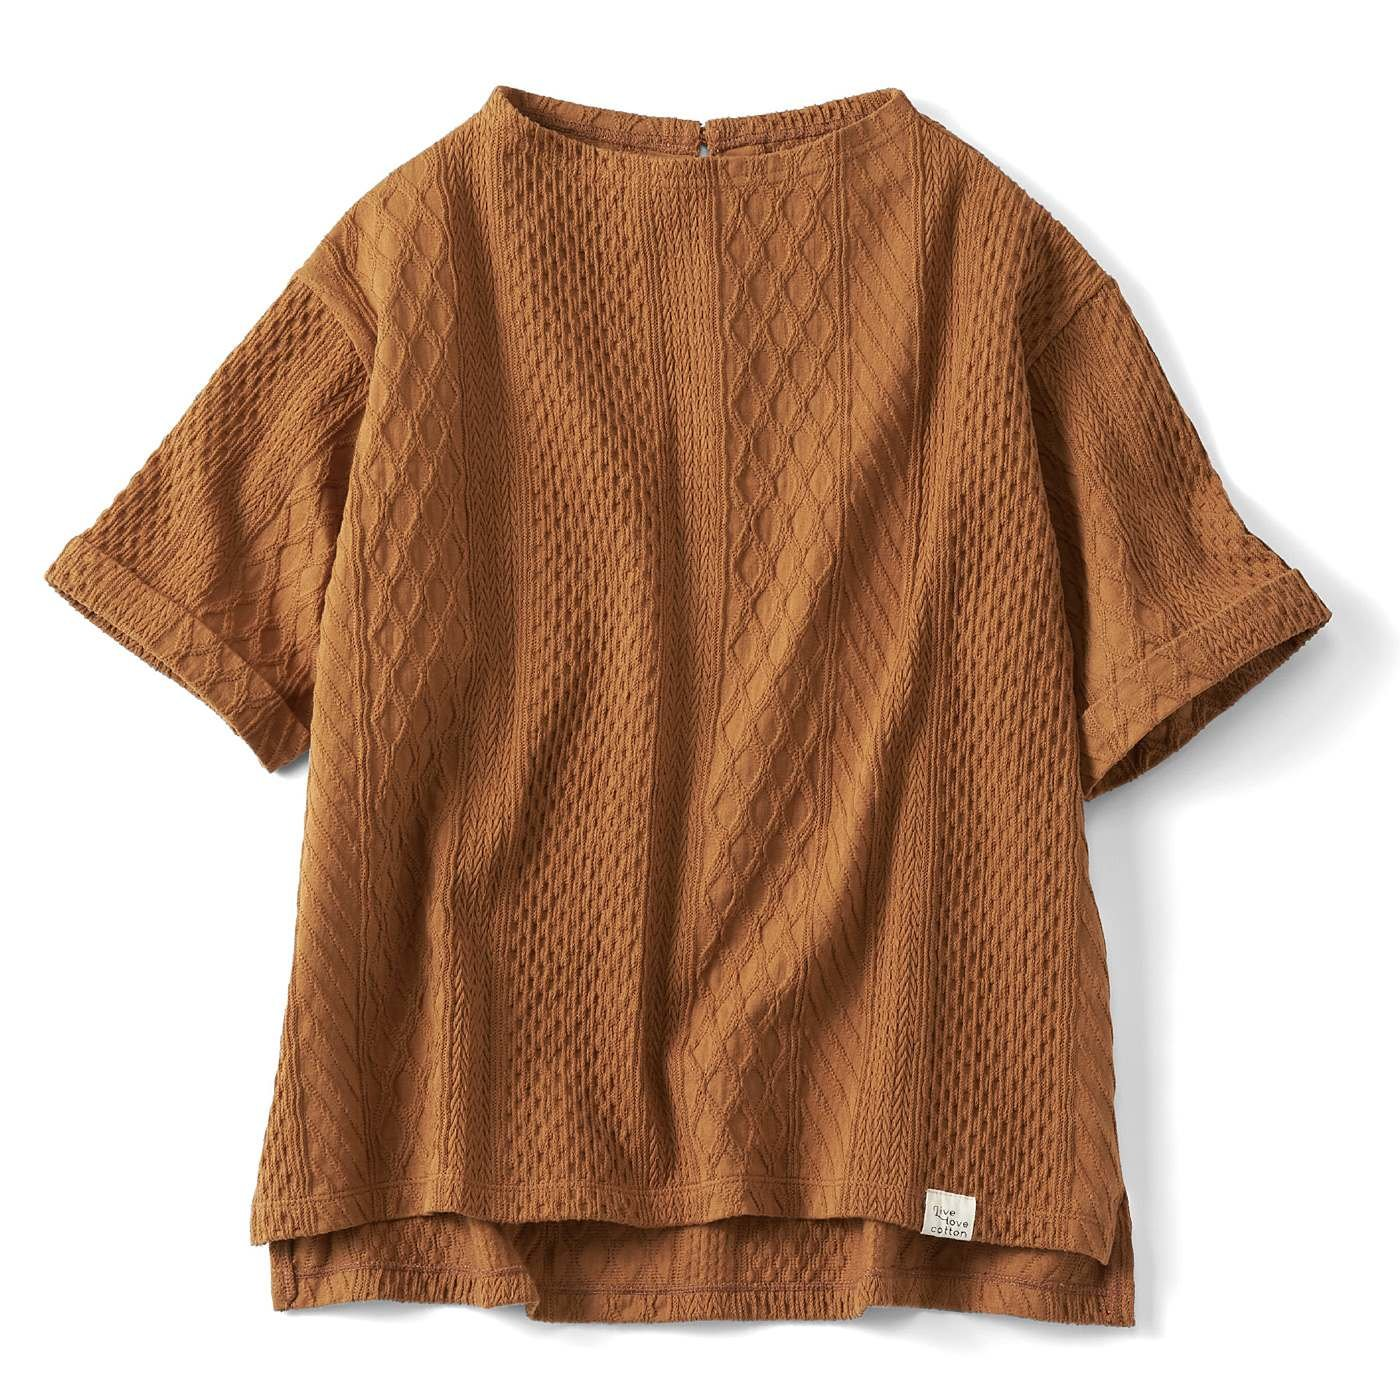 Live love cottonプロジェクト リブ イン コンフォート 編み柄が素敵な 厚手オーガニックコットン 半袖トップスの会